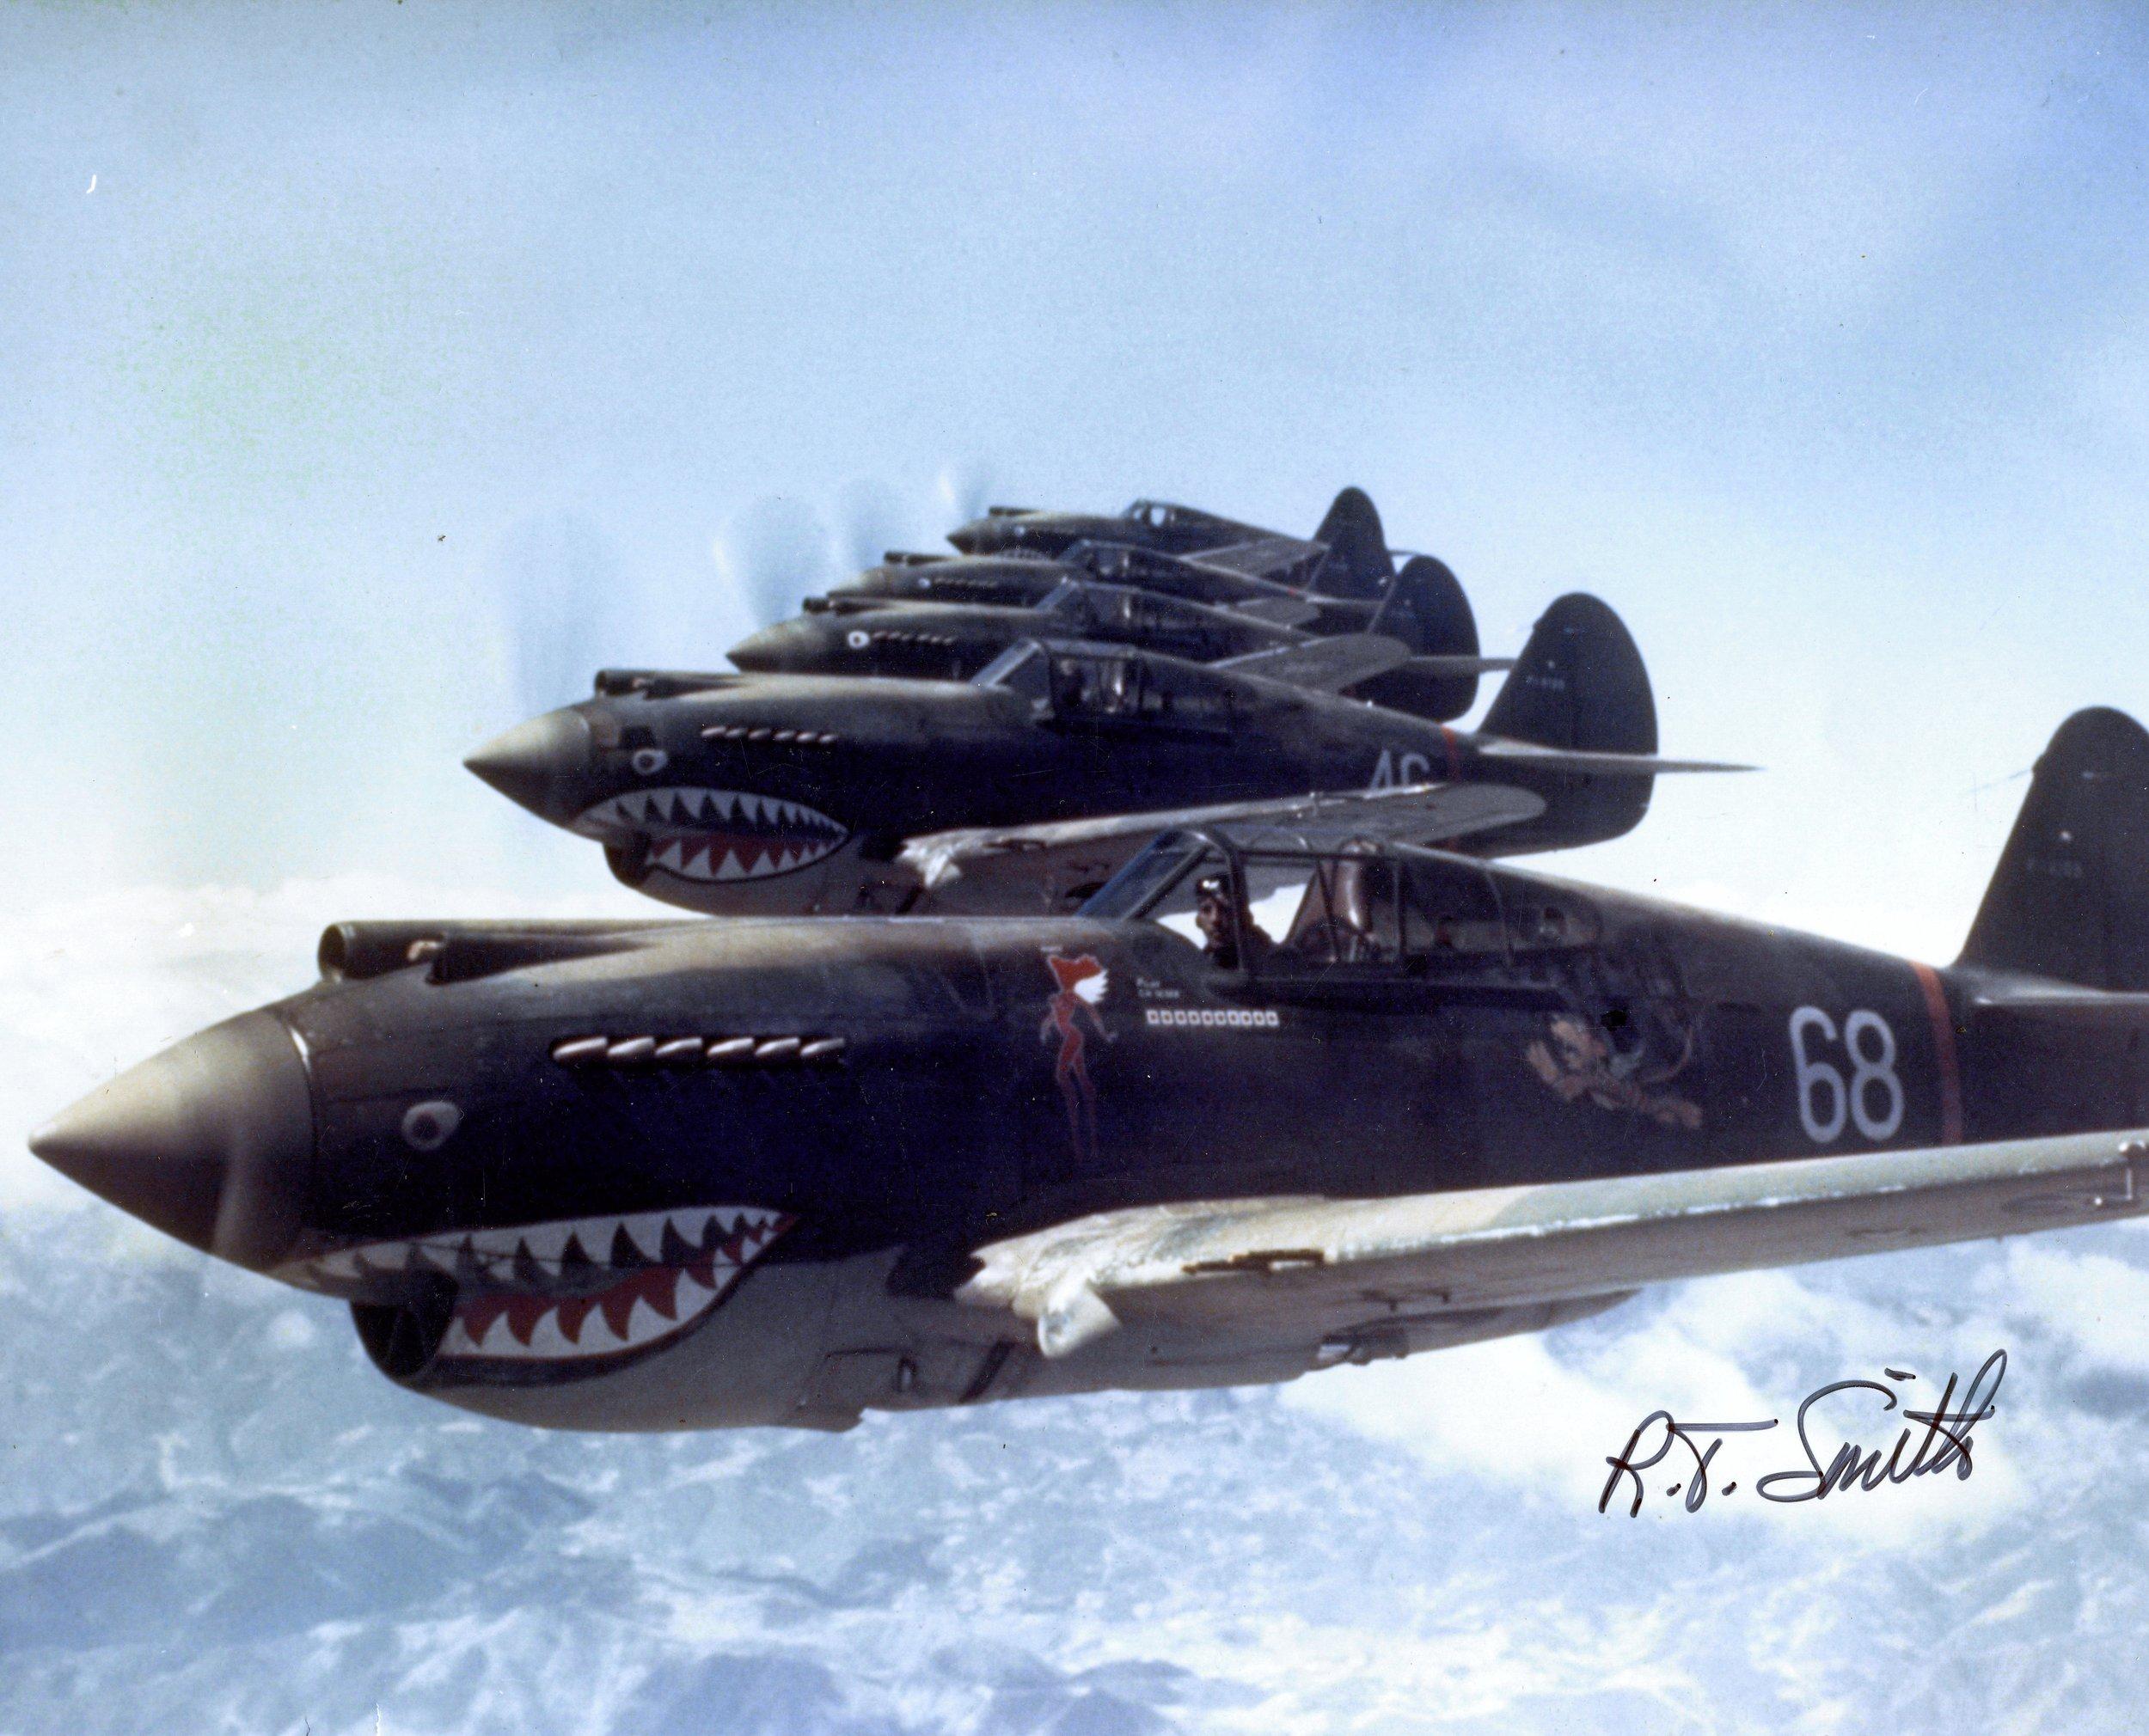 Hells_Angels,_Flying_Tigers_1942.jpg